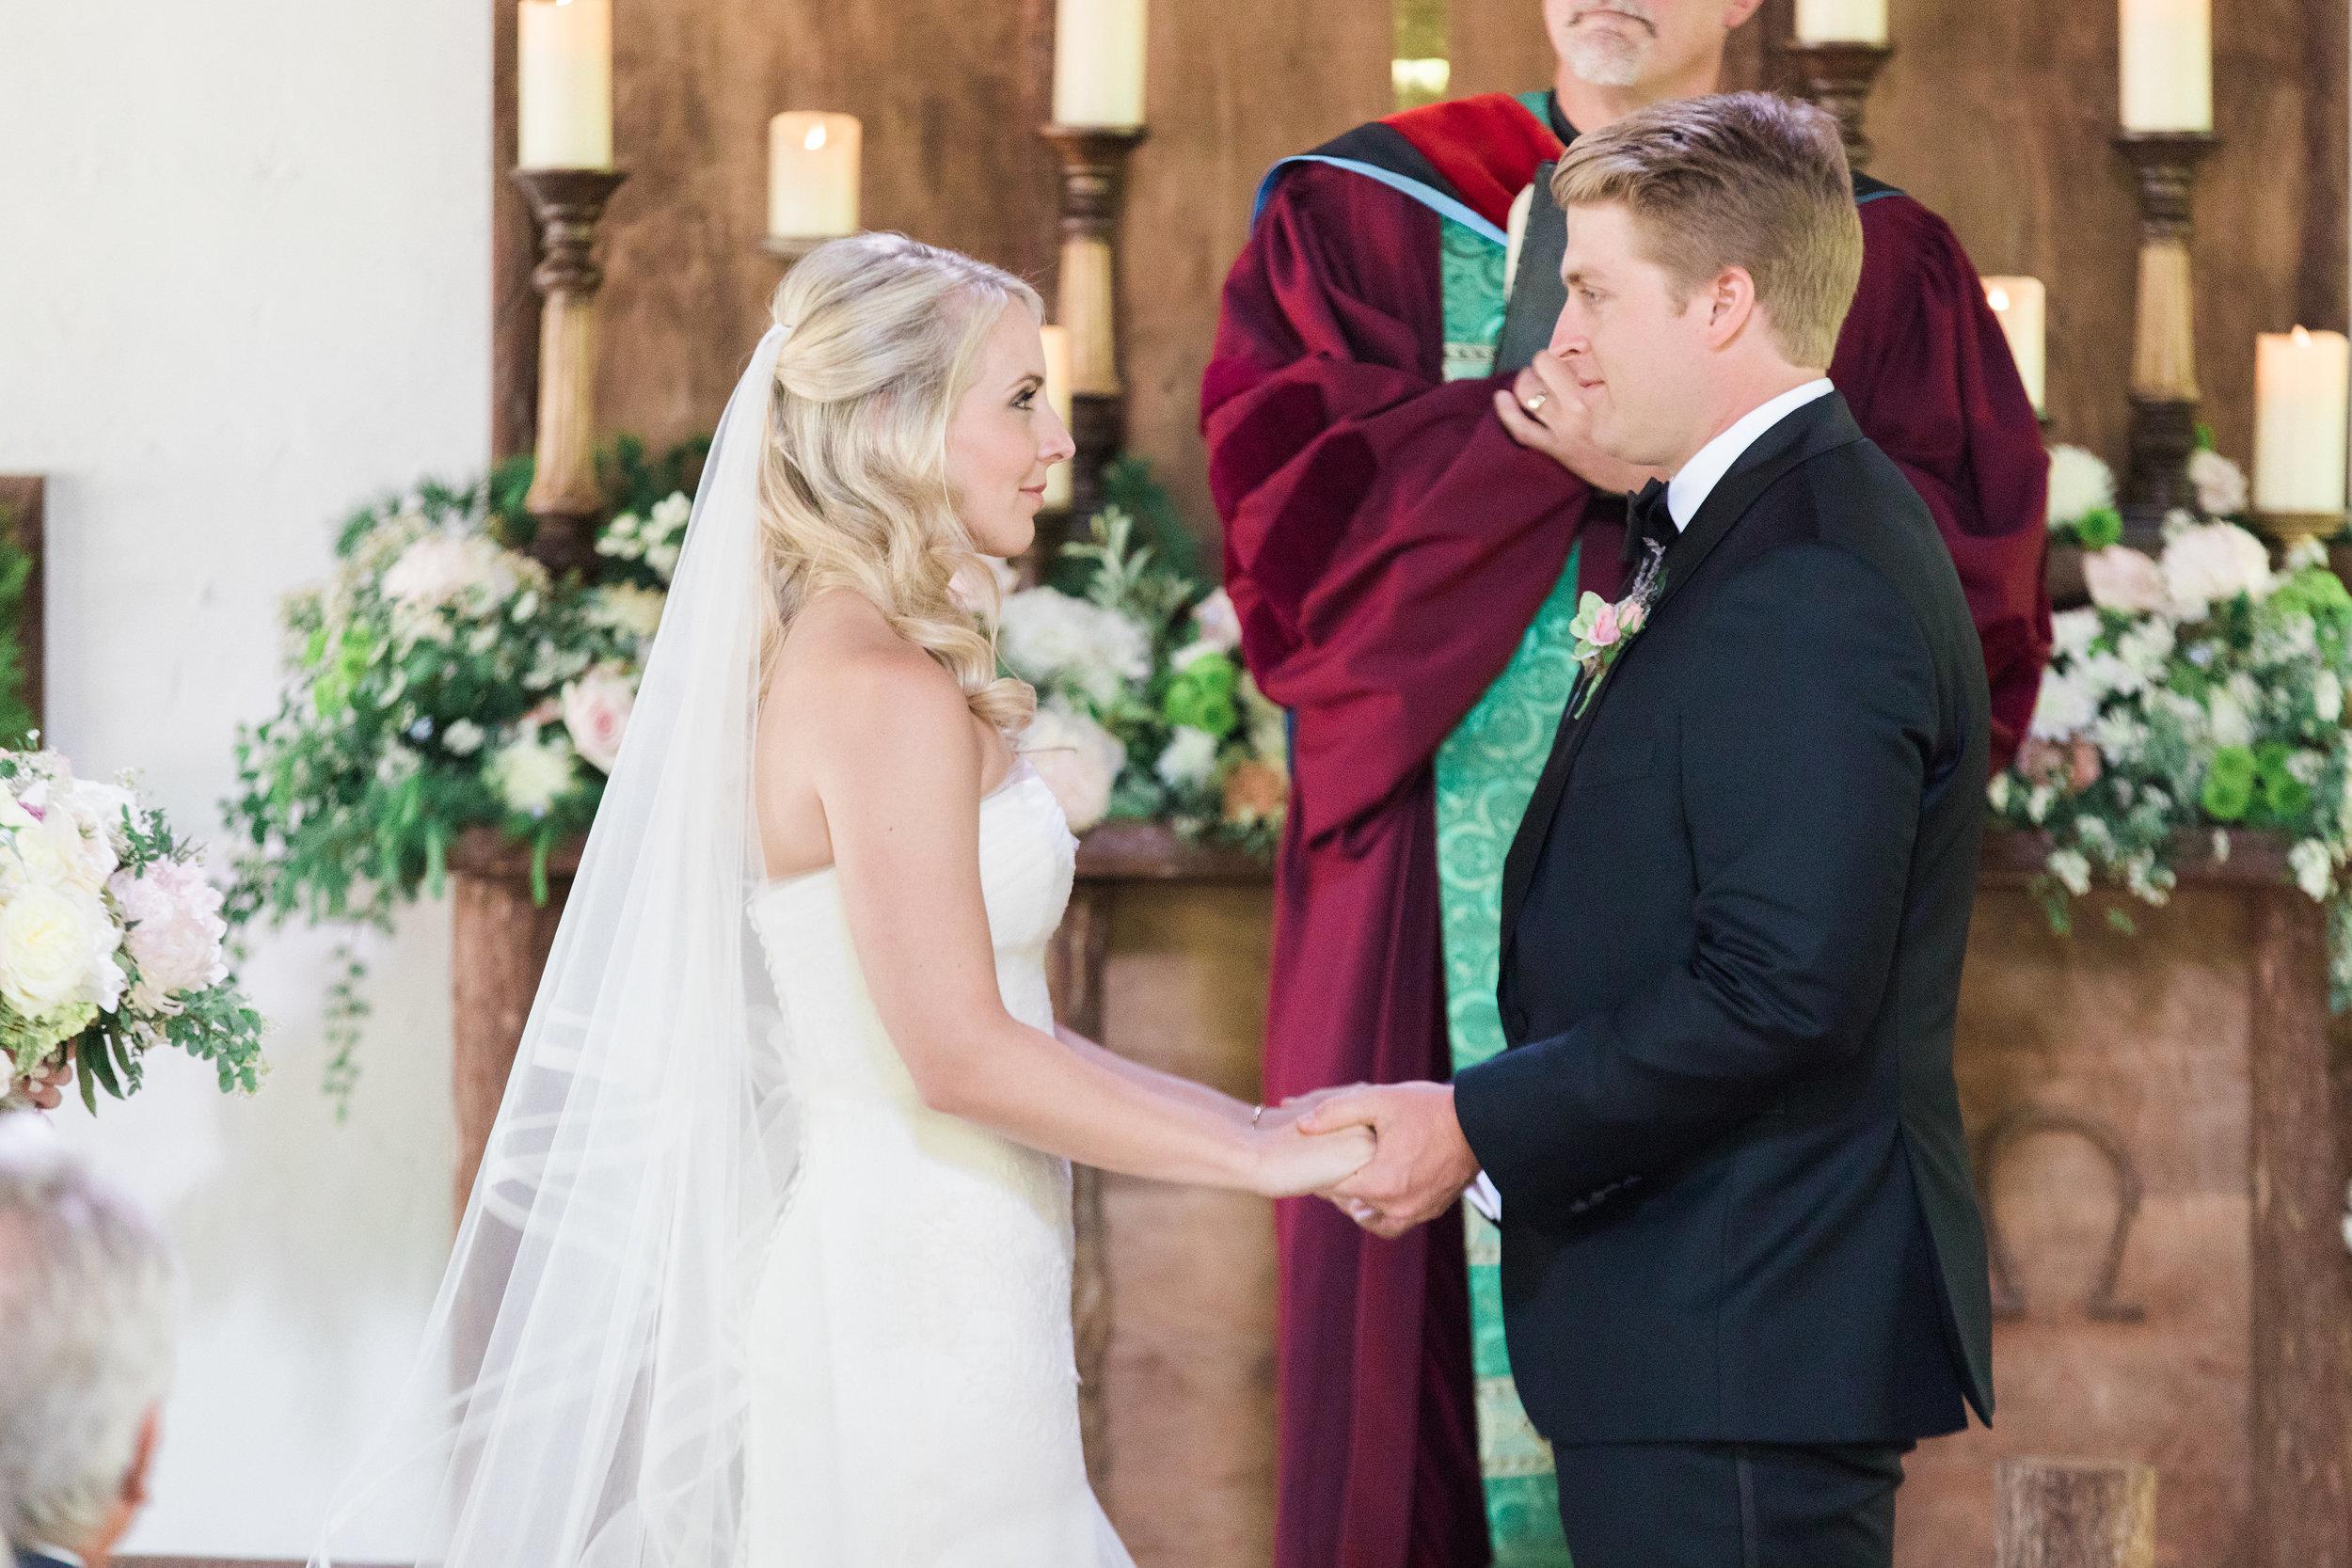 Coffman+Wedding+Ceremony-86.jpg